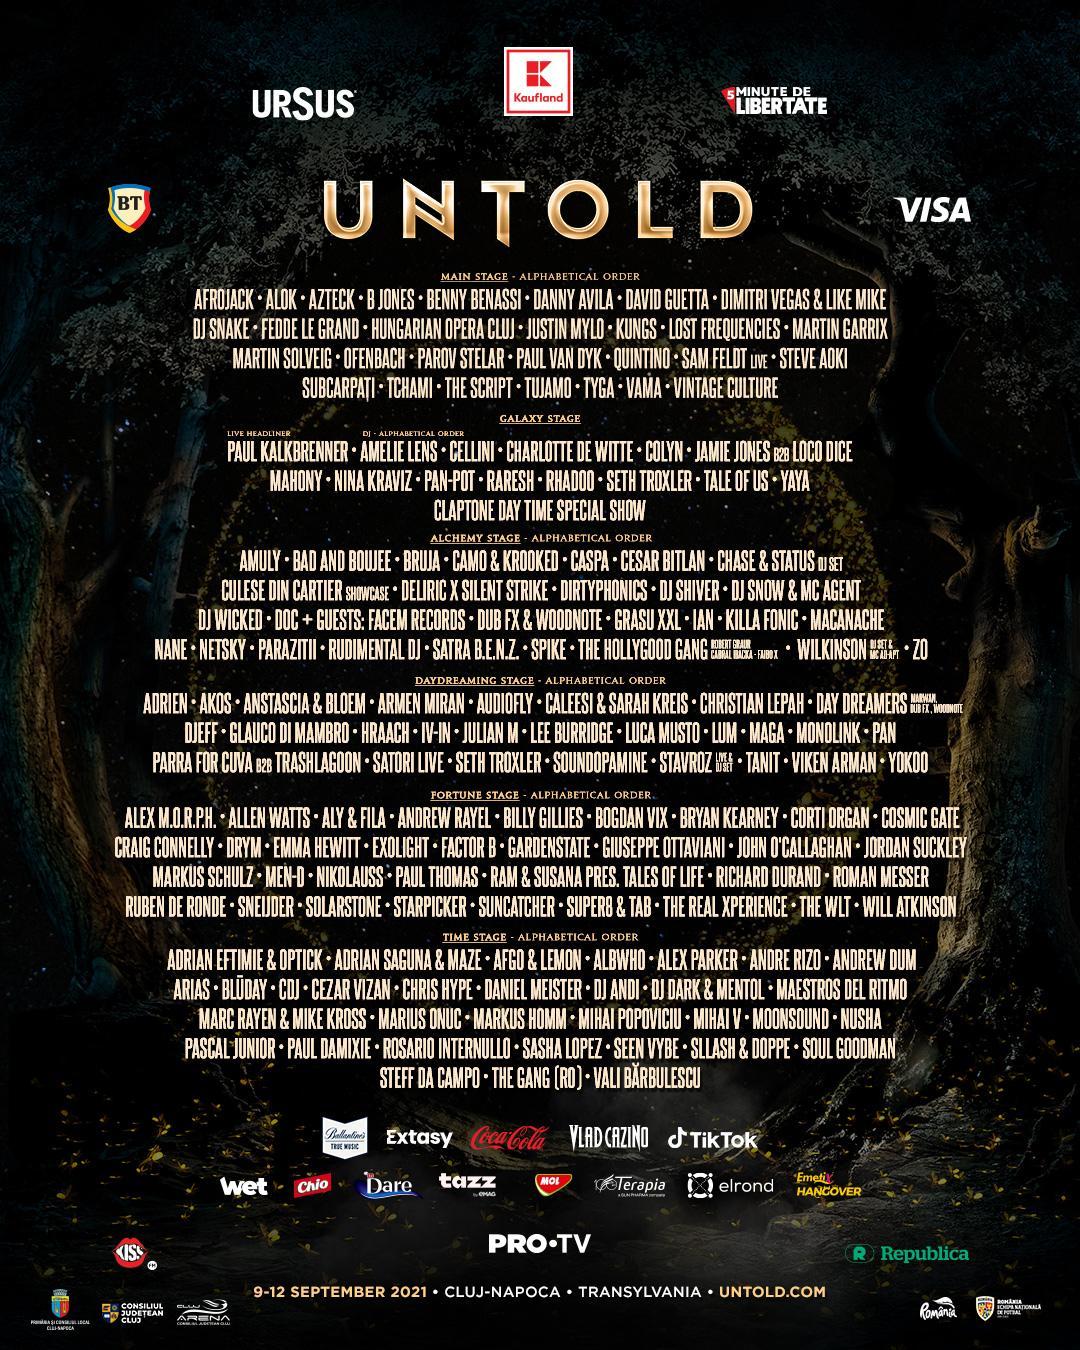 lineup-ul untold 2021 artisti